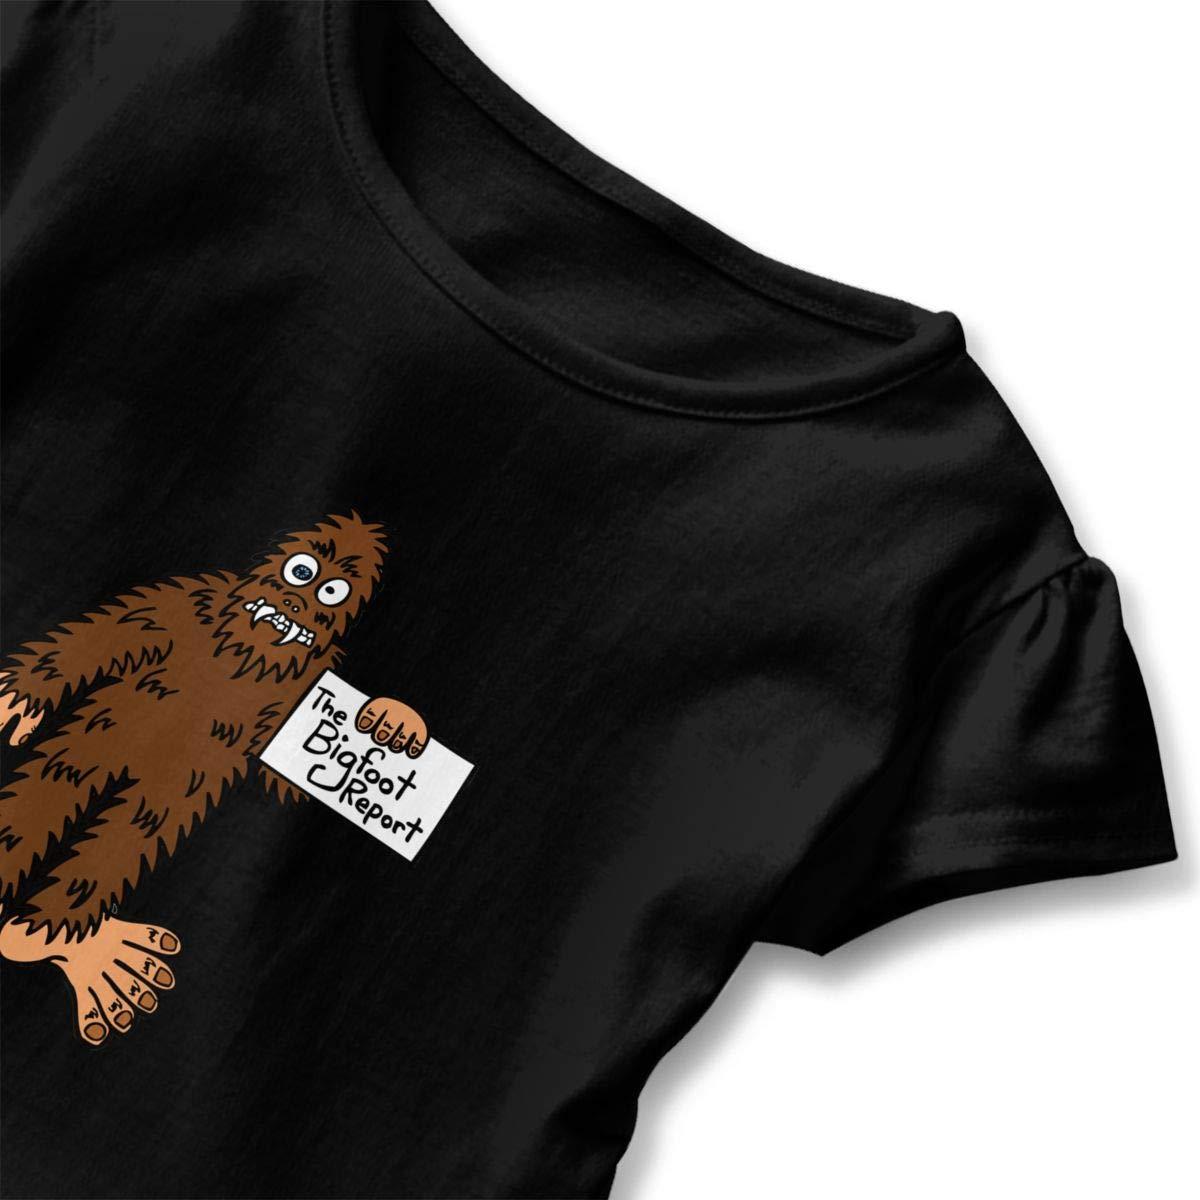 CZnuen The Bigfoot Report Baby Girls Round Neck Short Sleeve Ruffle T-Shirt Top